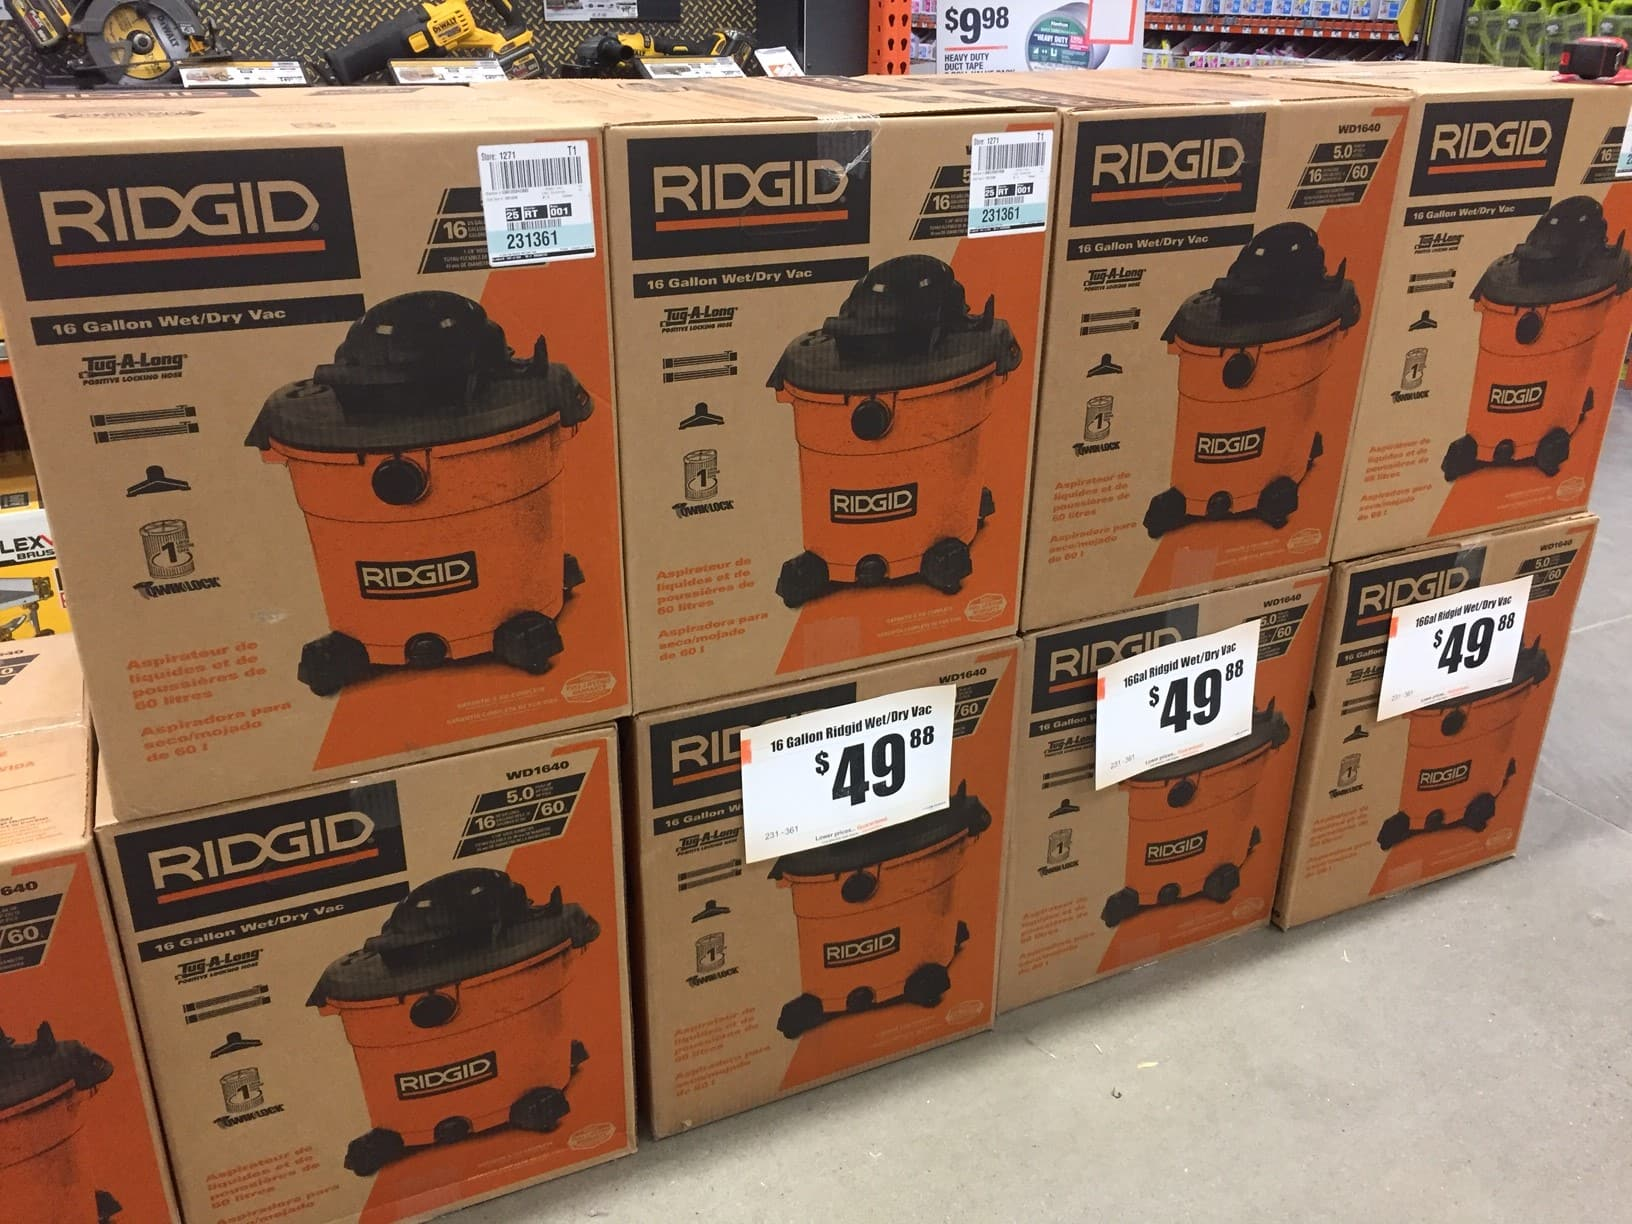 RIDGID 16 gal 5 0 Peak HP Wet Dry Vac $49 88 Home Depot B&M